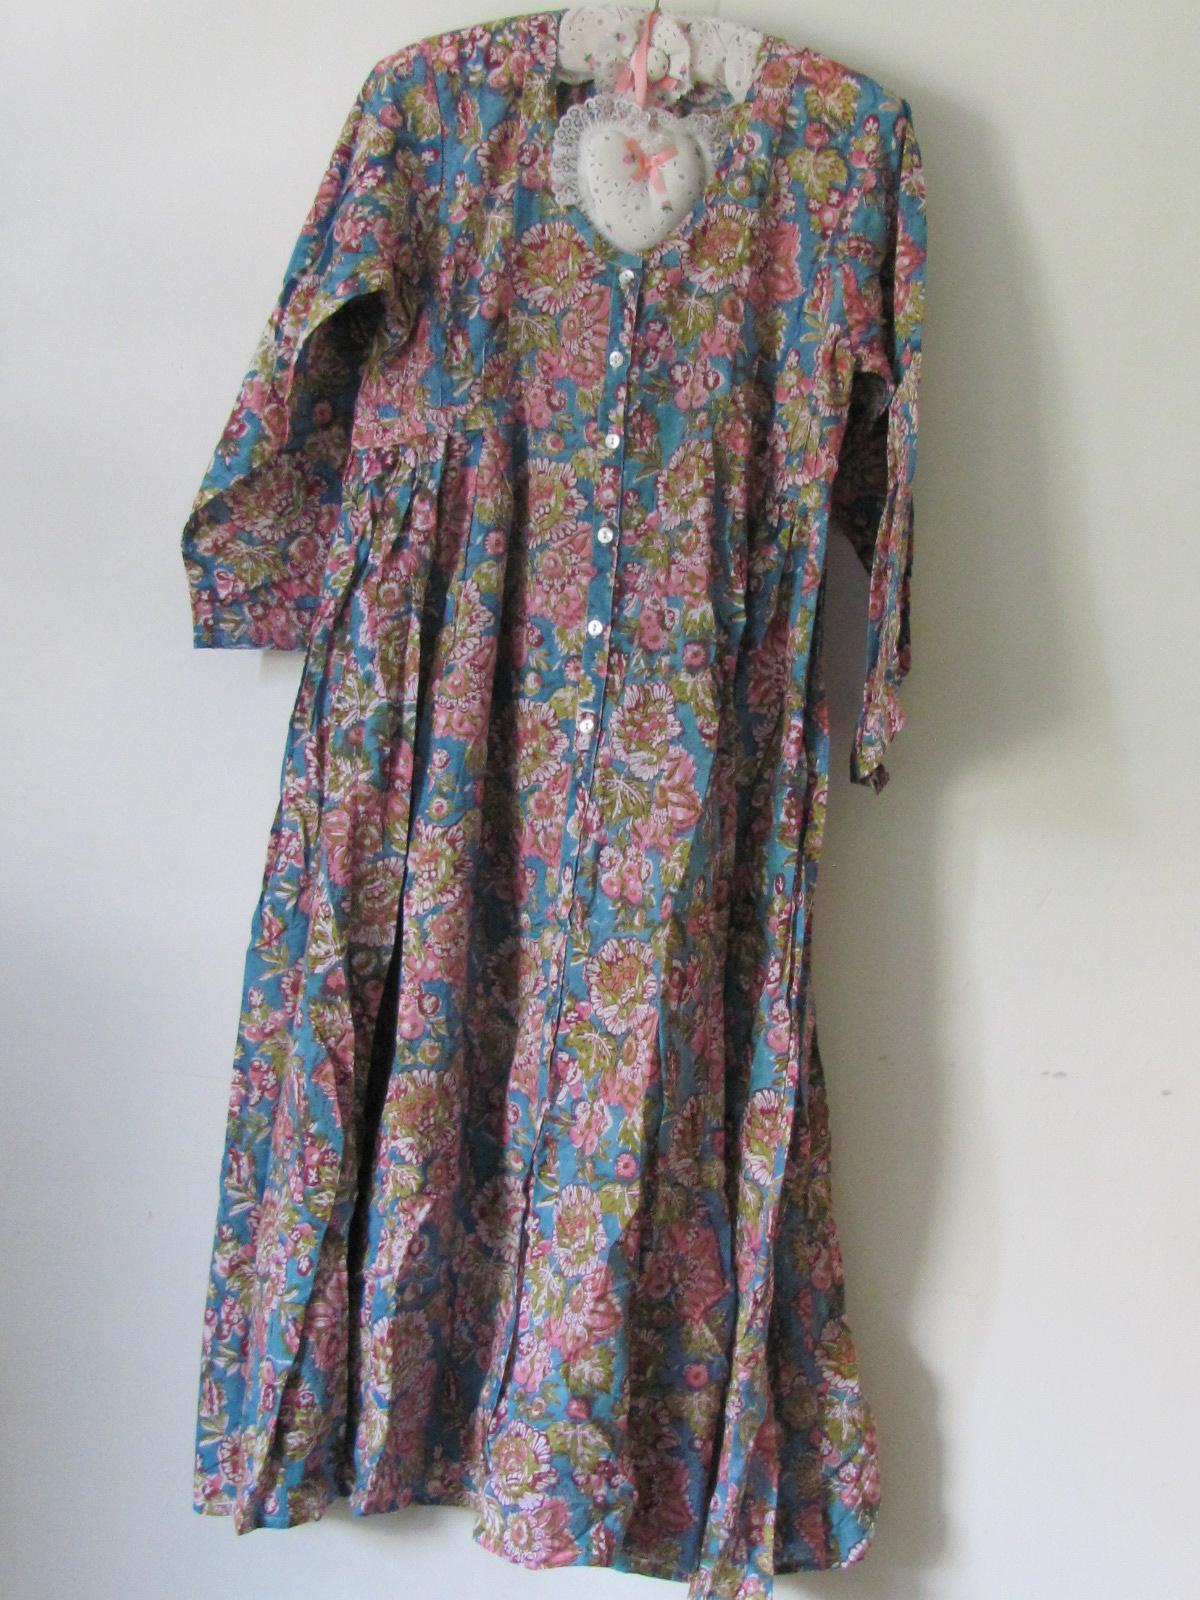 Block Print (over) jurk voluminous  rok, katoen